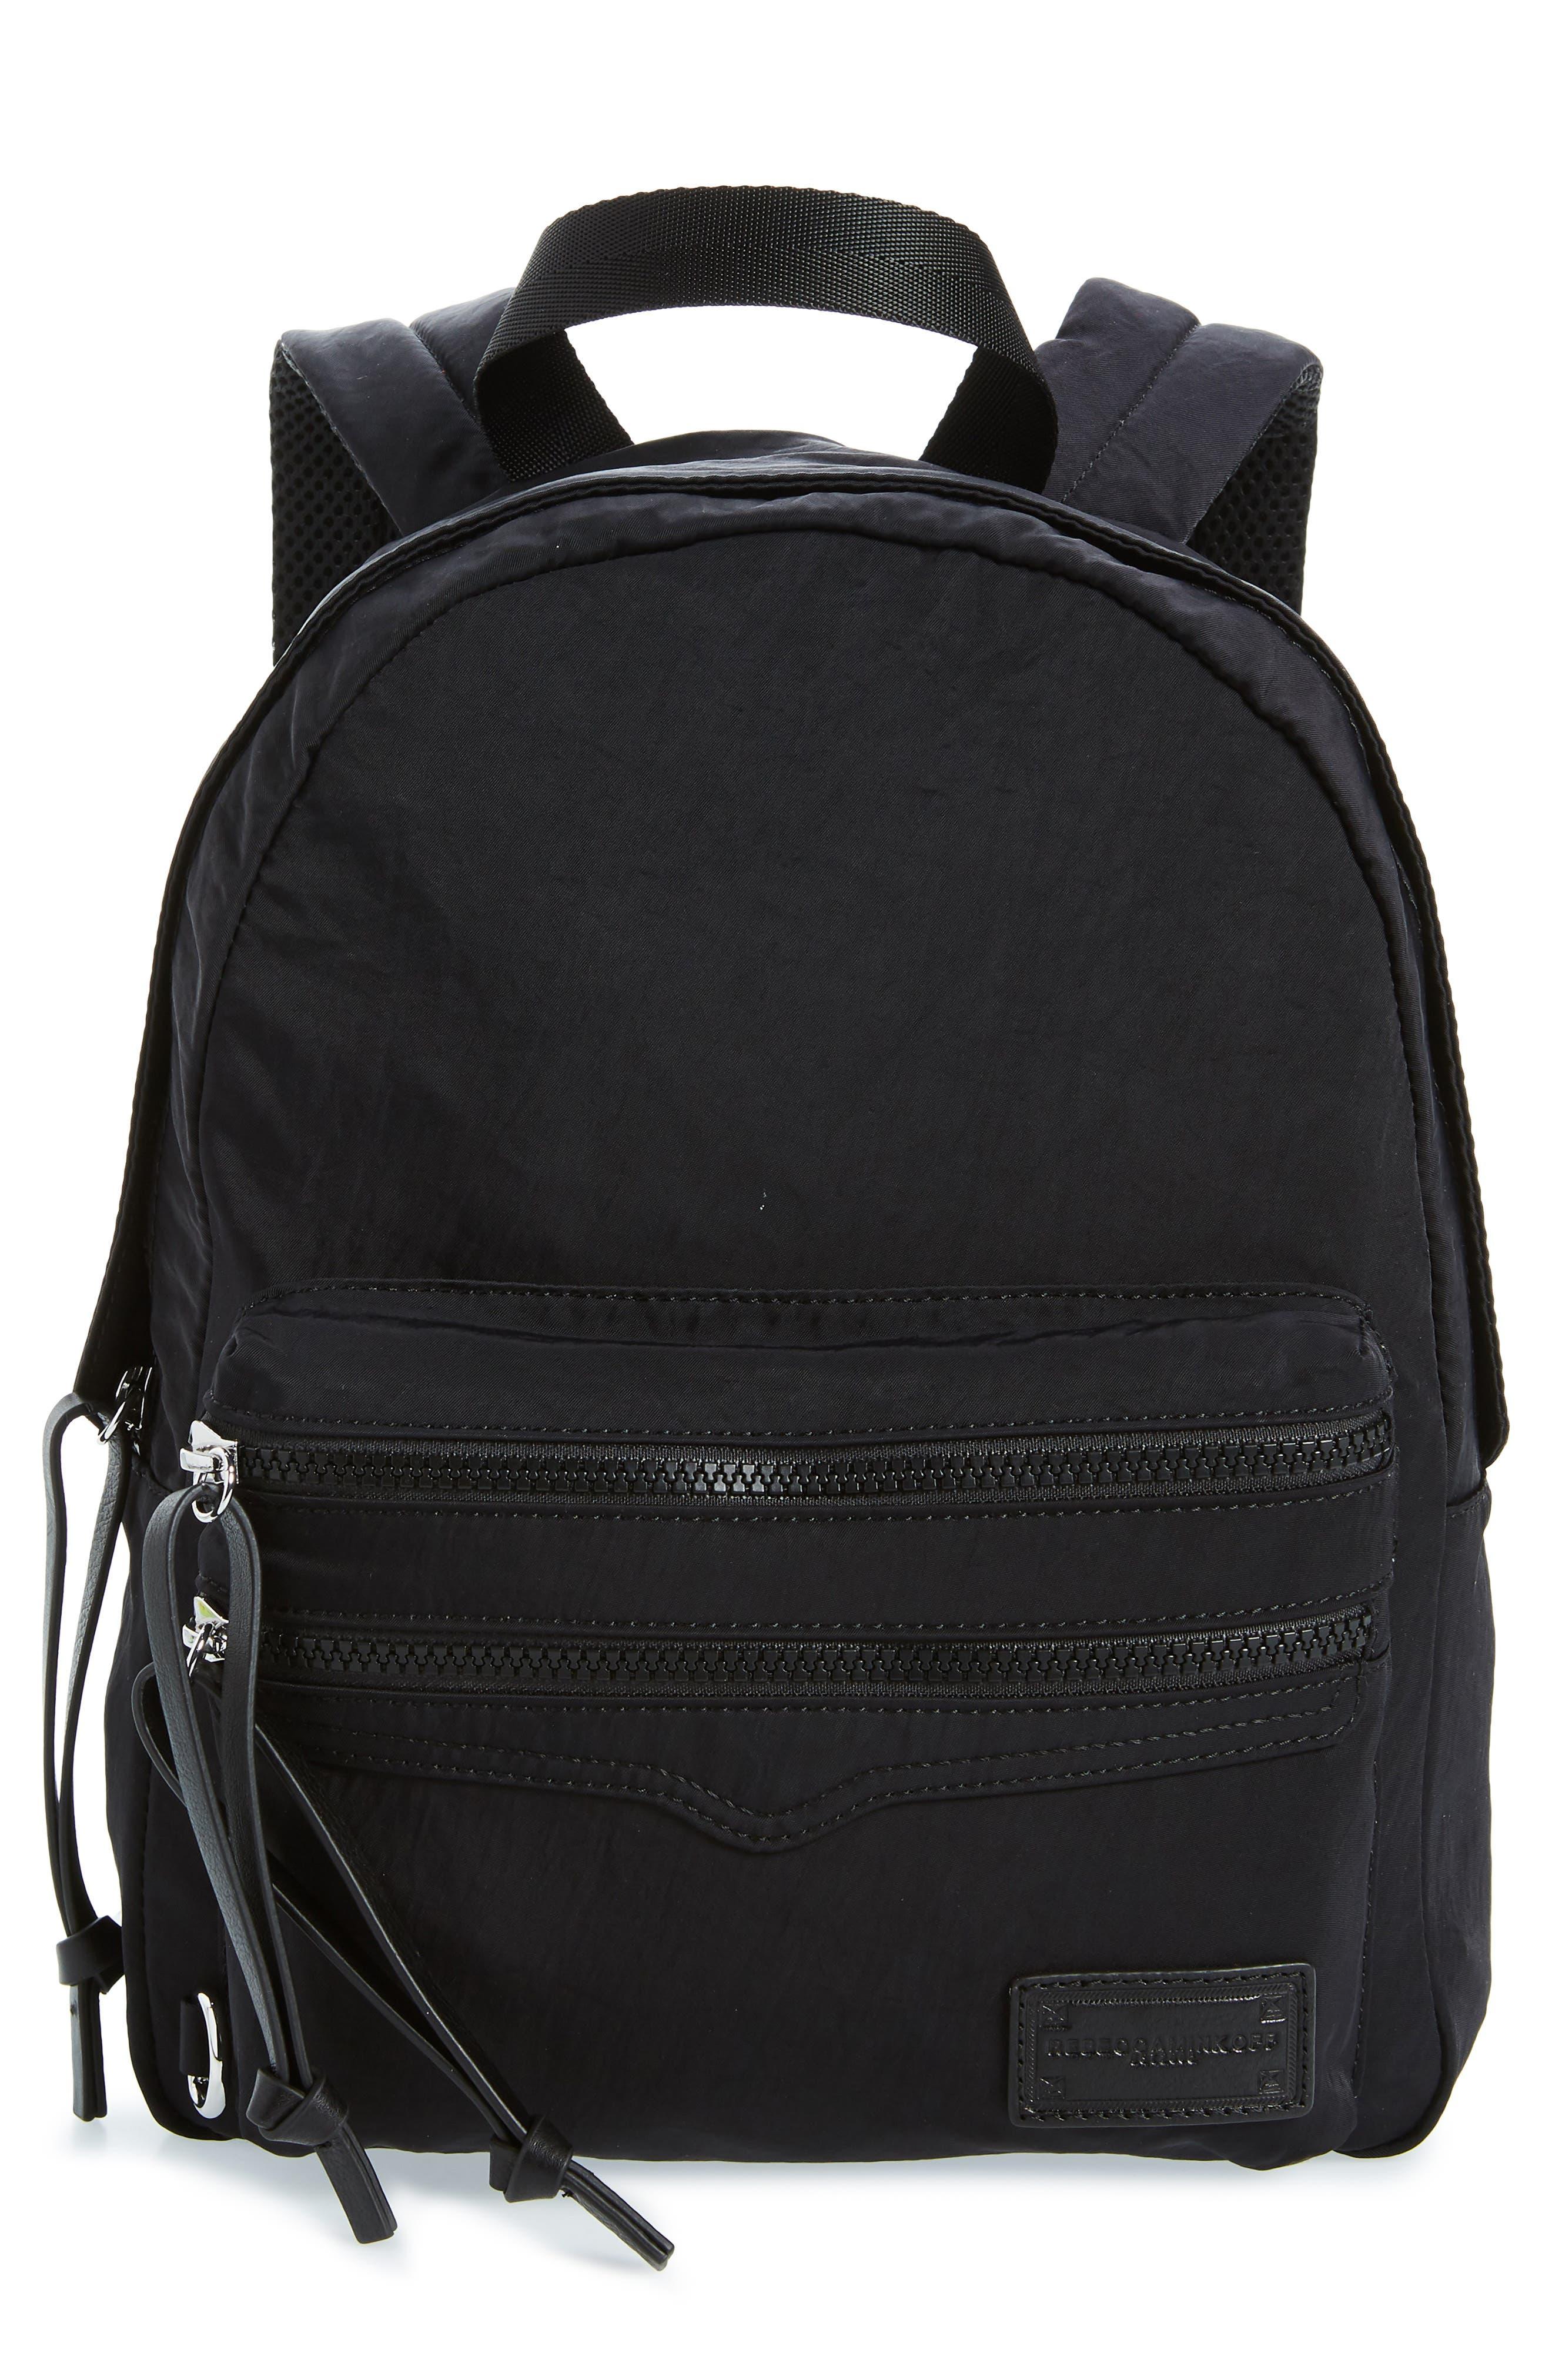 REBECCA MINKOFF, Nylon Backpack, Main thumbnail 1, color, BLACK